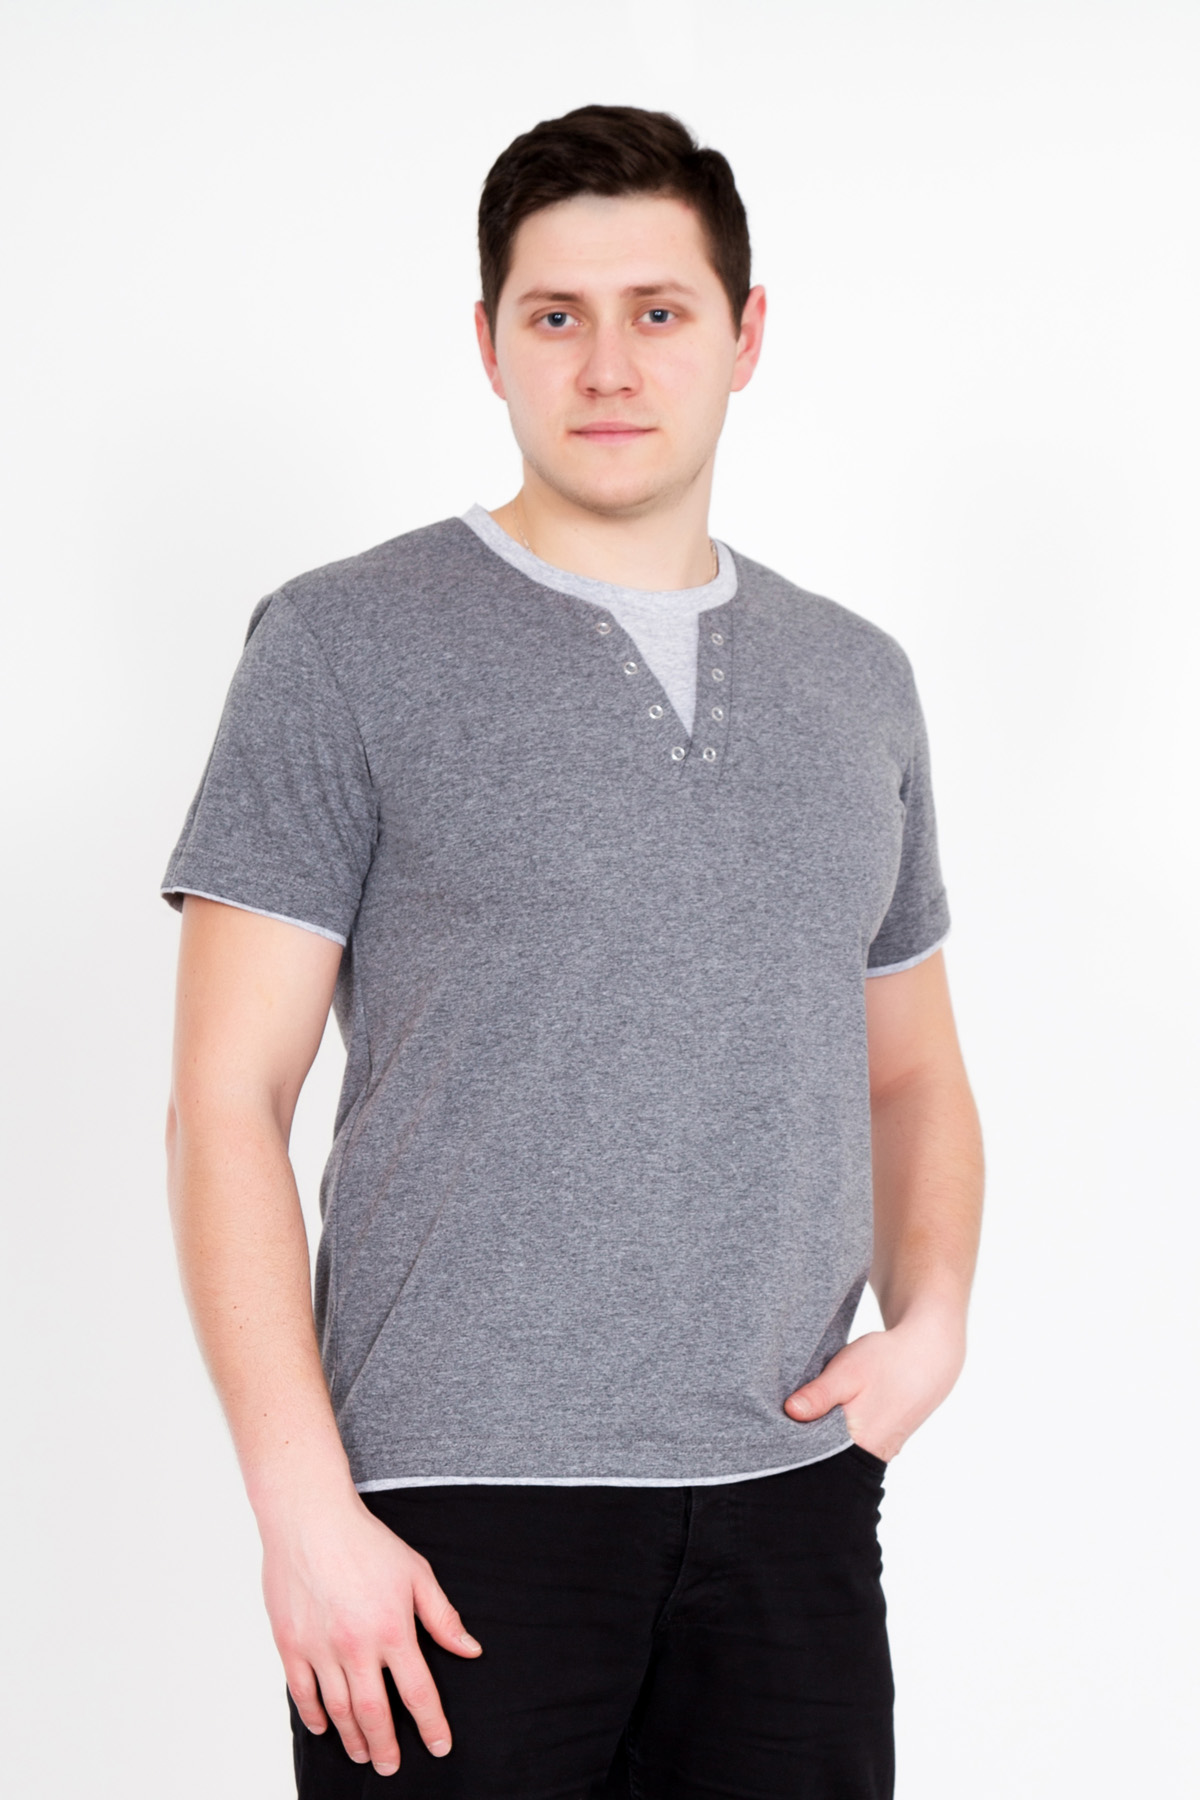 Муж. футболка Джон Серый р. 66Футболки и майки<br>Обхват груди:132 см<br>Обхват талии:128 см<br>Обхват бедер:134 см<br>Длина по спинке:74 см<br>Рост:178-188 см<br><br>Тип: Муж. футболка<br>Размер: 66<br>Материал: Кулирка